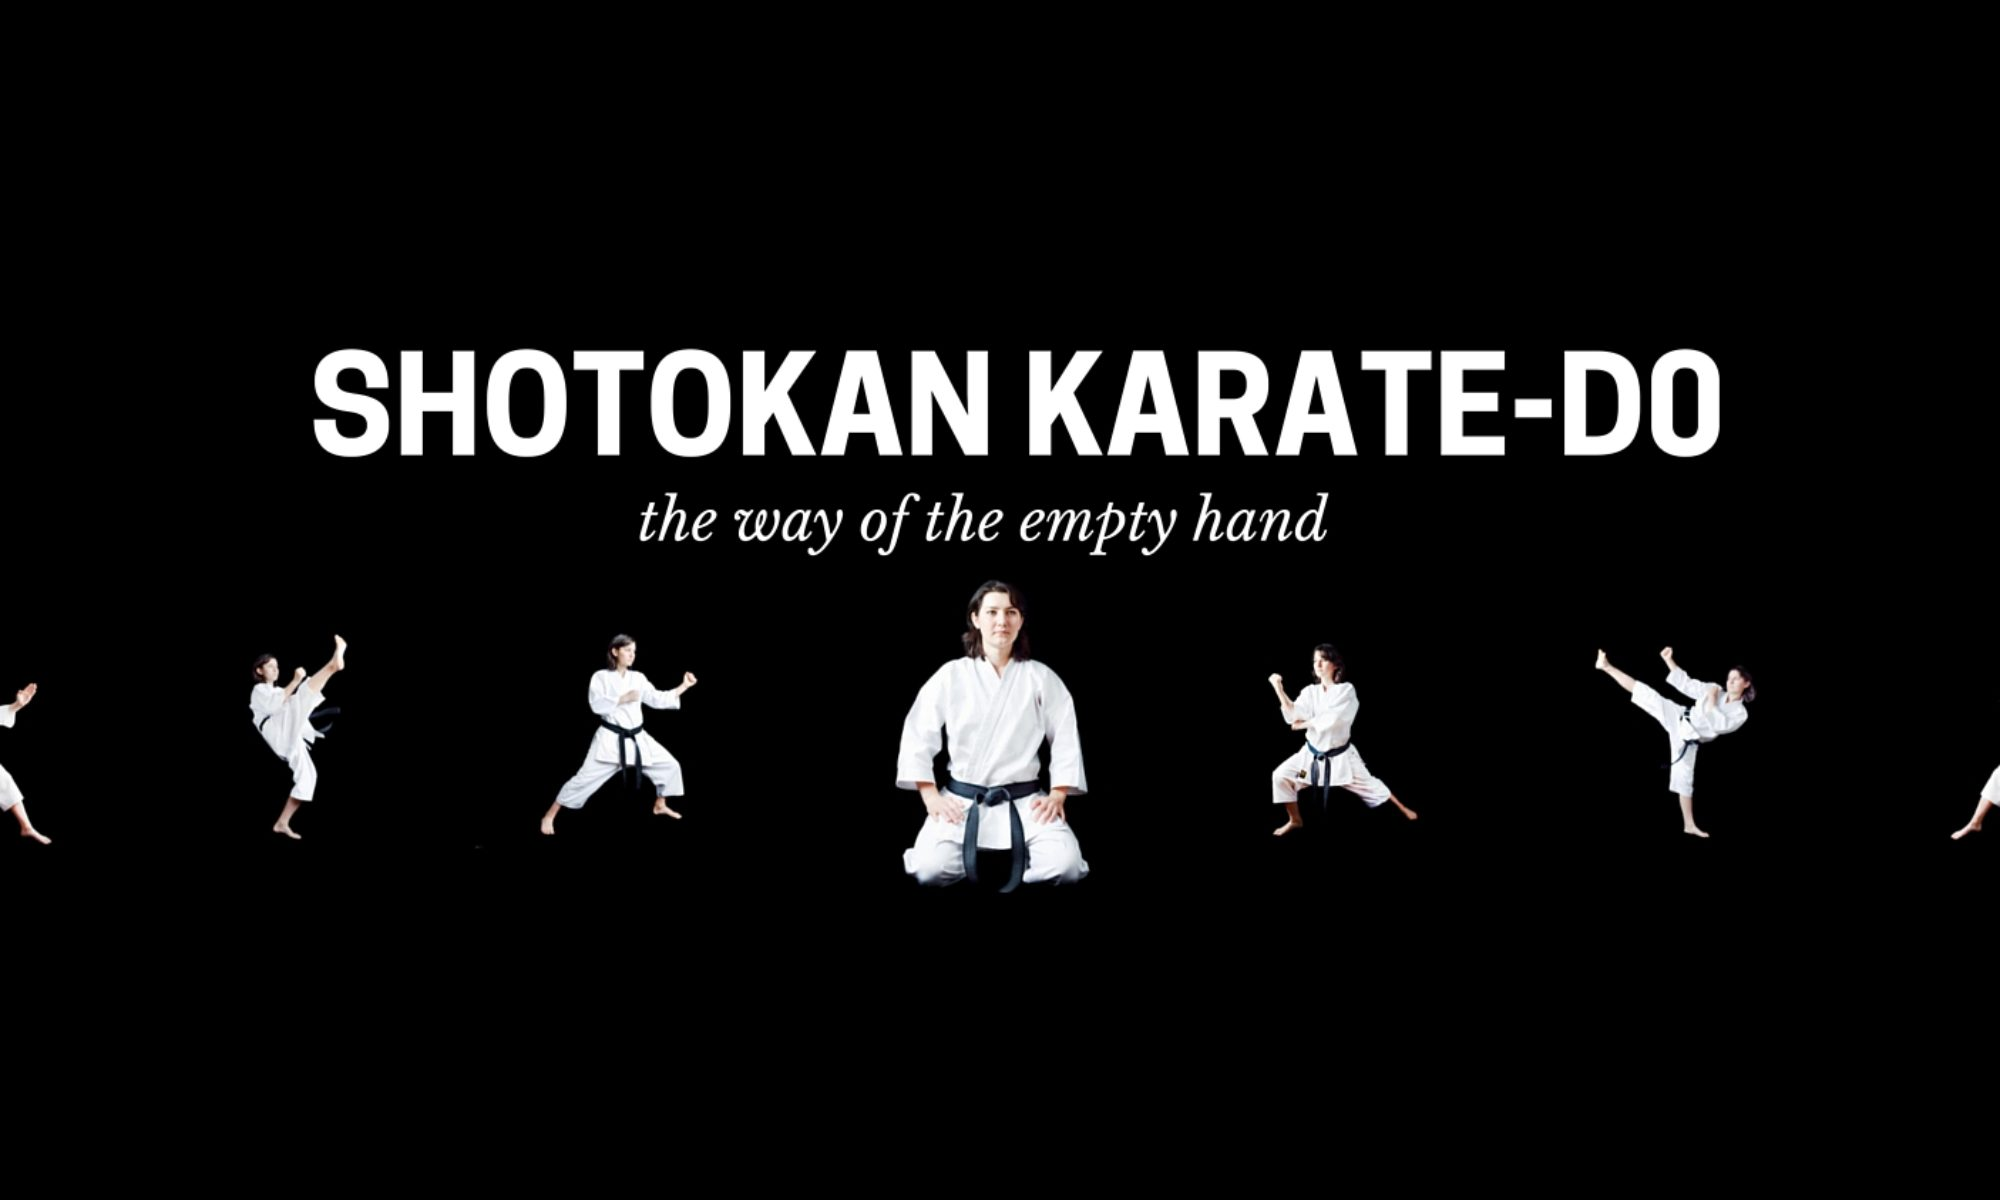 Legacy Karate Club